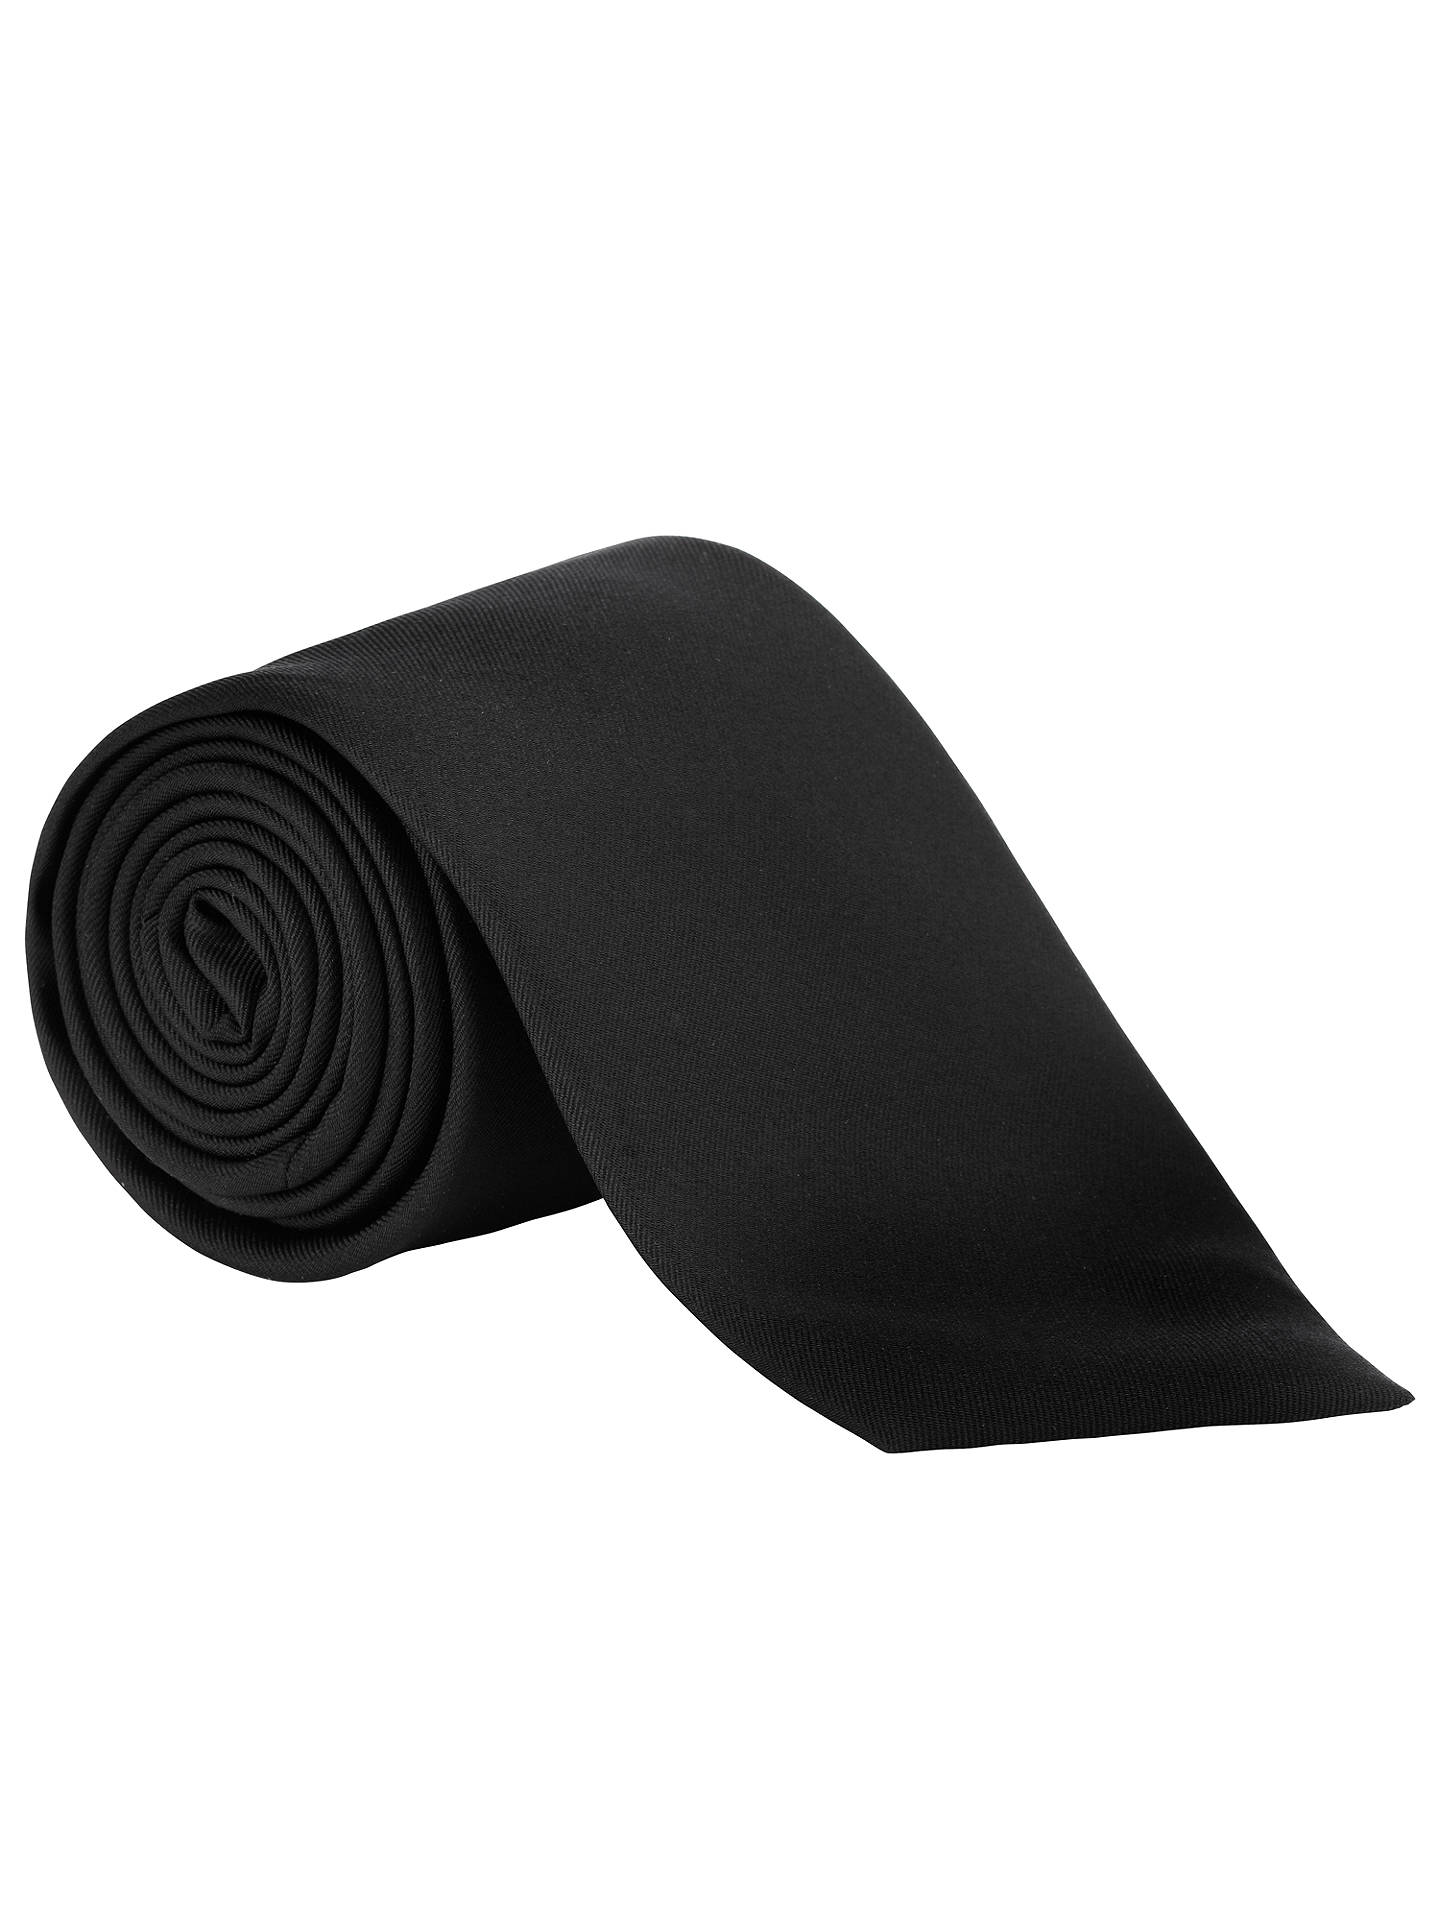 22a25b10abfb Buy John Lewis & Partners Fine Twill Plain Silk Tie, Black Online at  johnlewis.